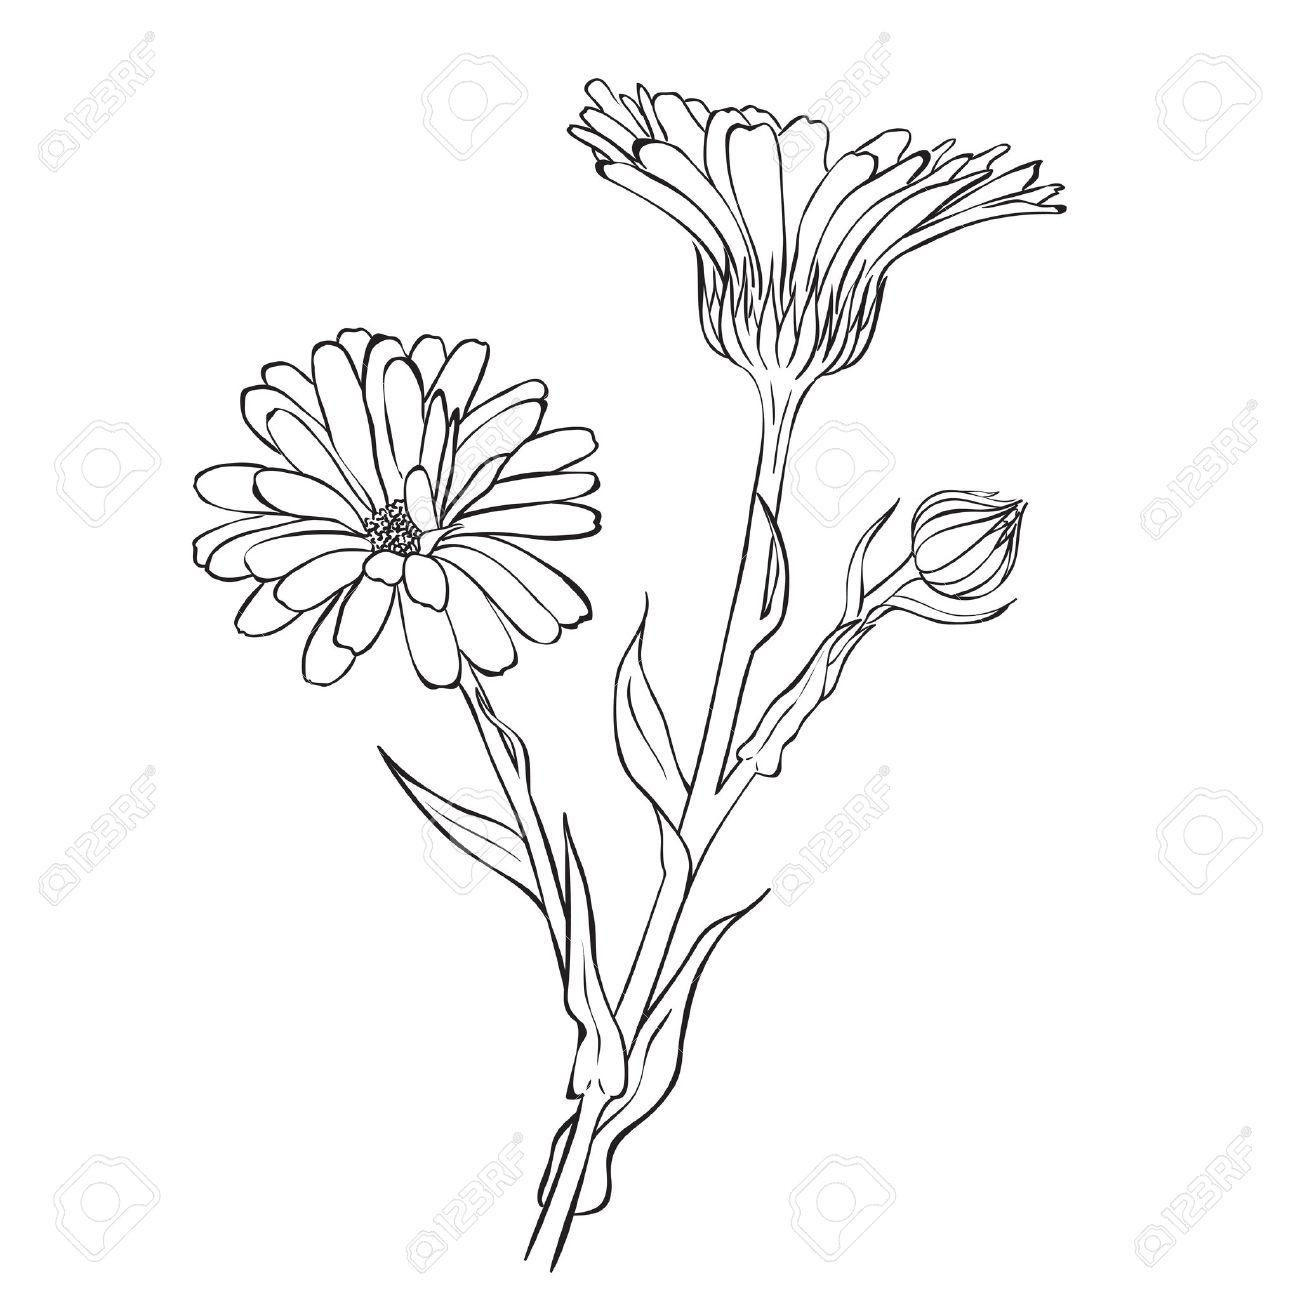 Hand drawn flowers - Calendula officinalis or pot marigold. Ink style drawing - 36312818